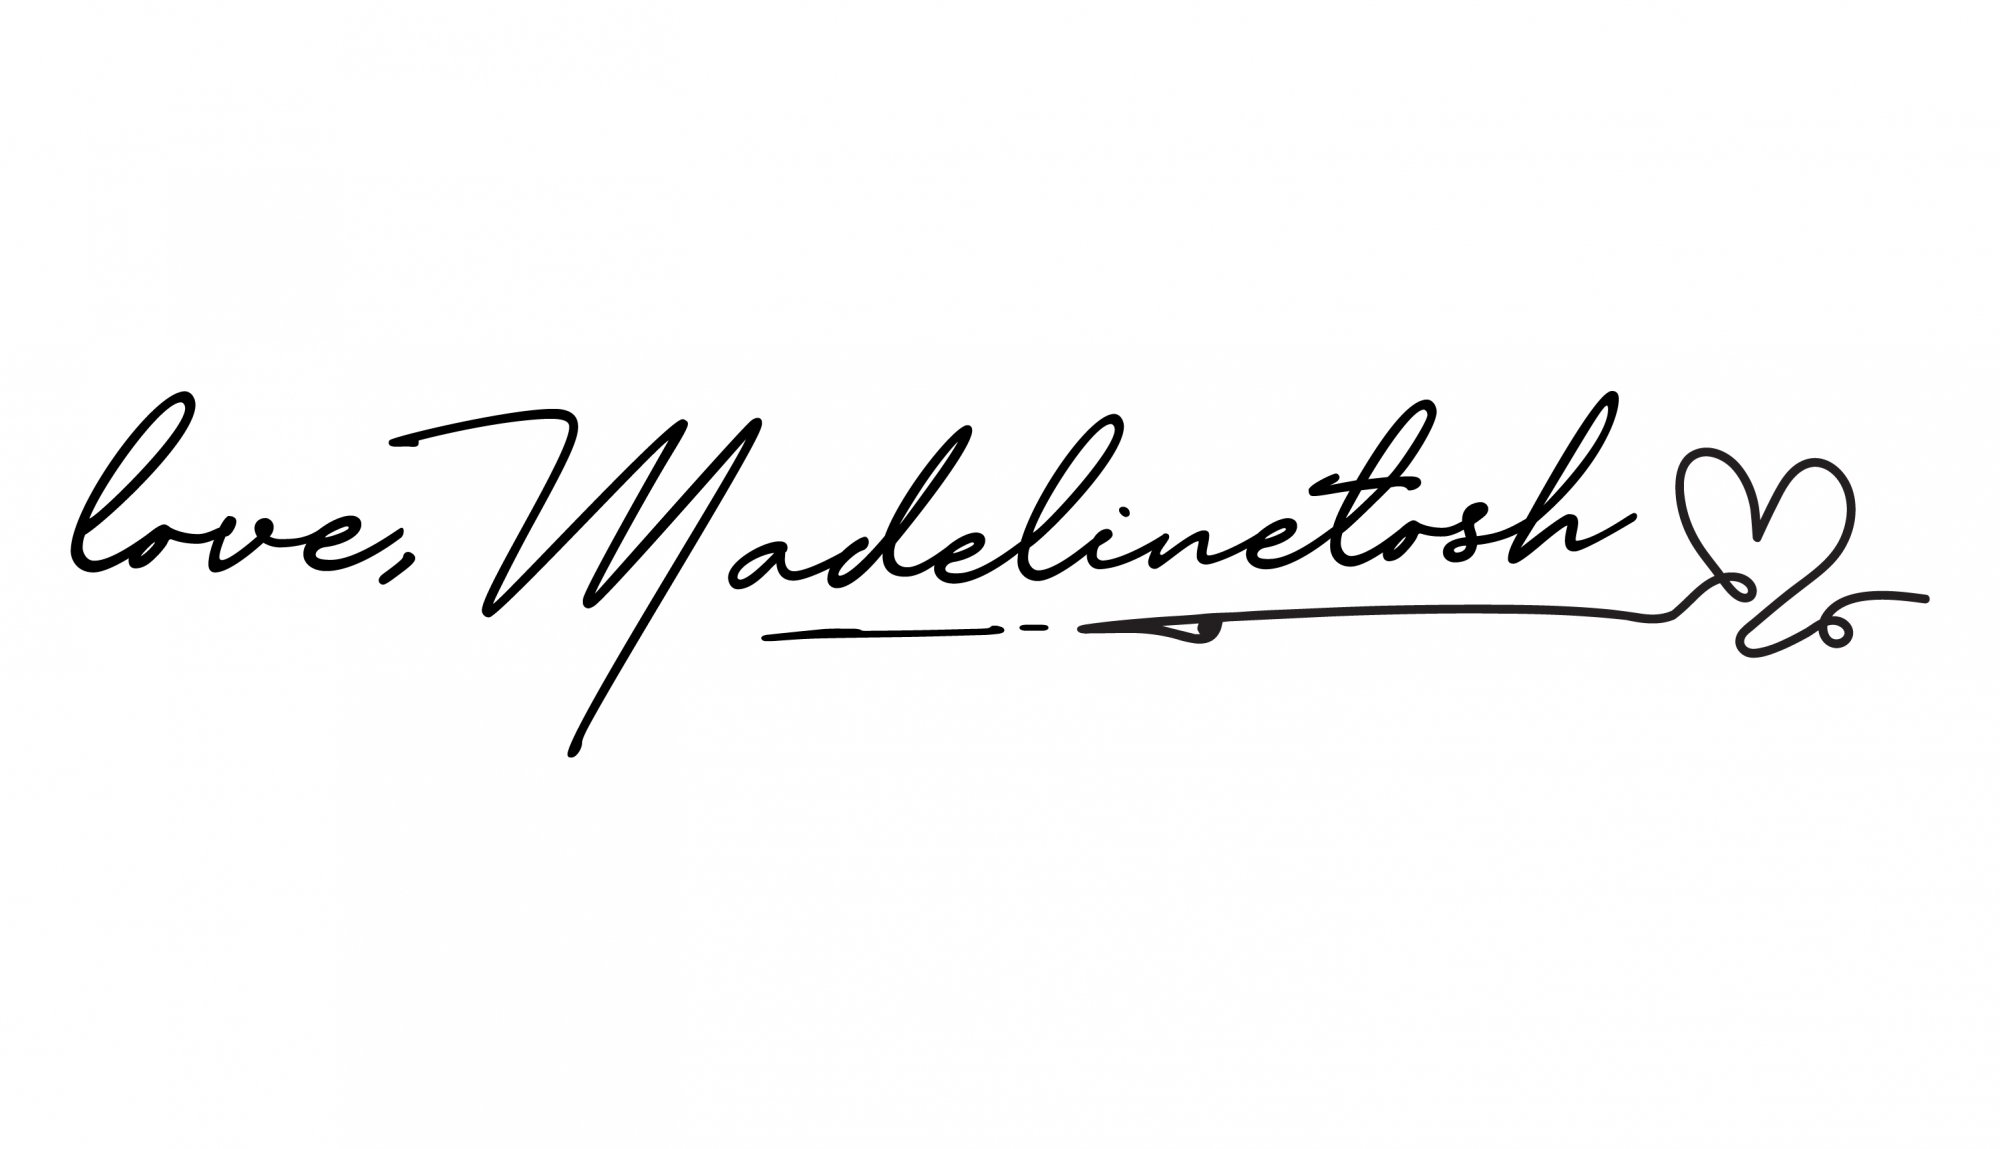 love, Madelinetosh